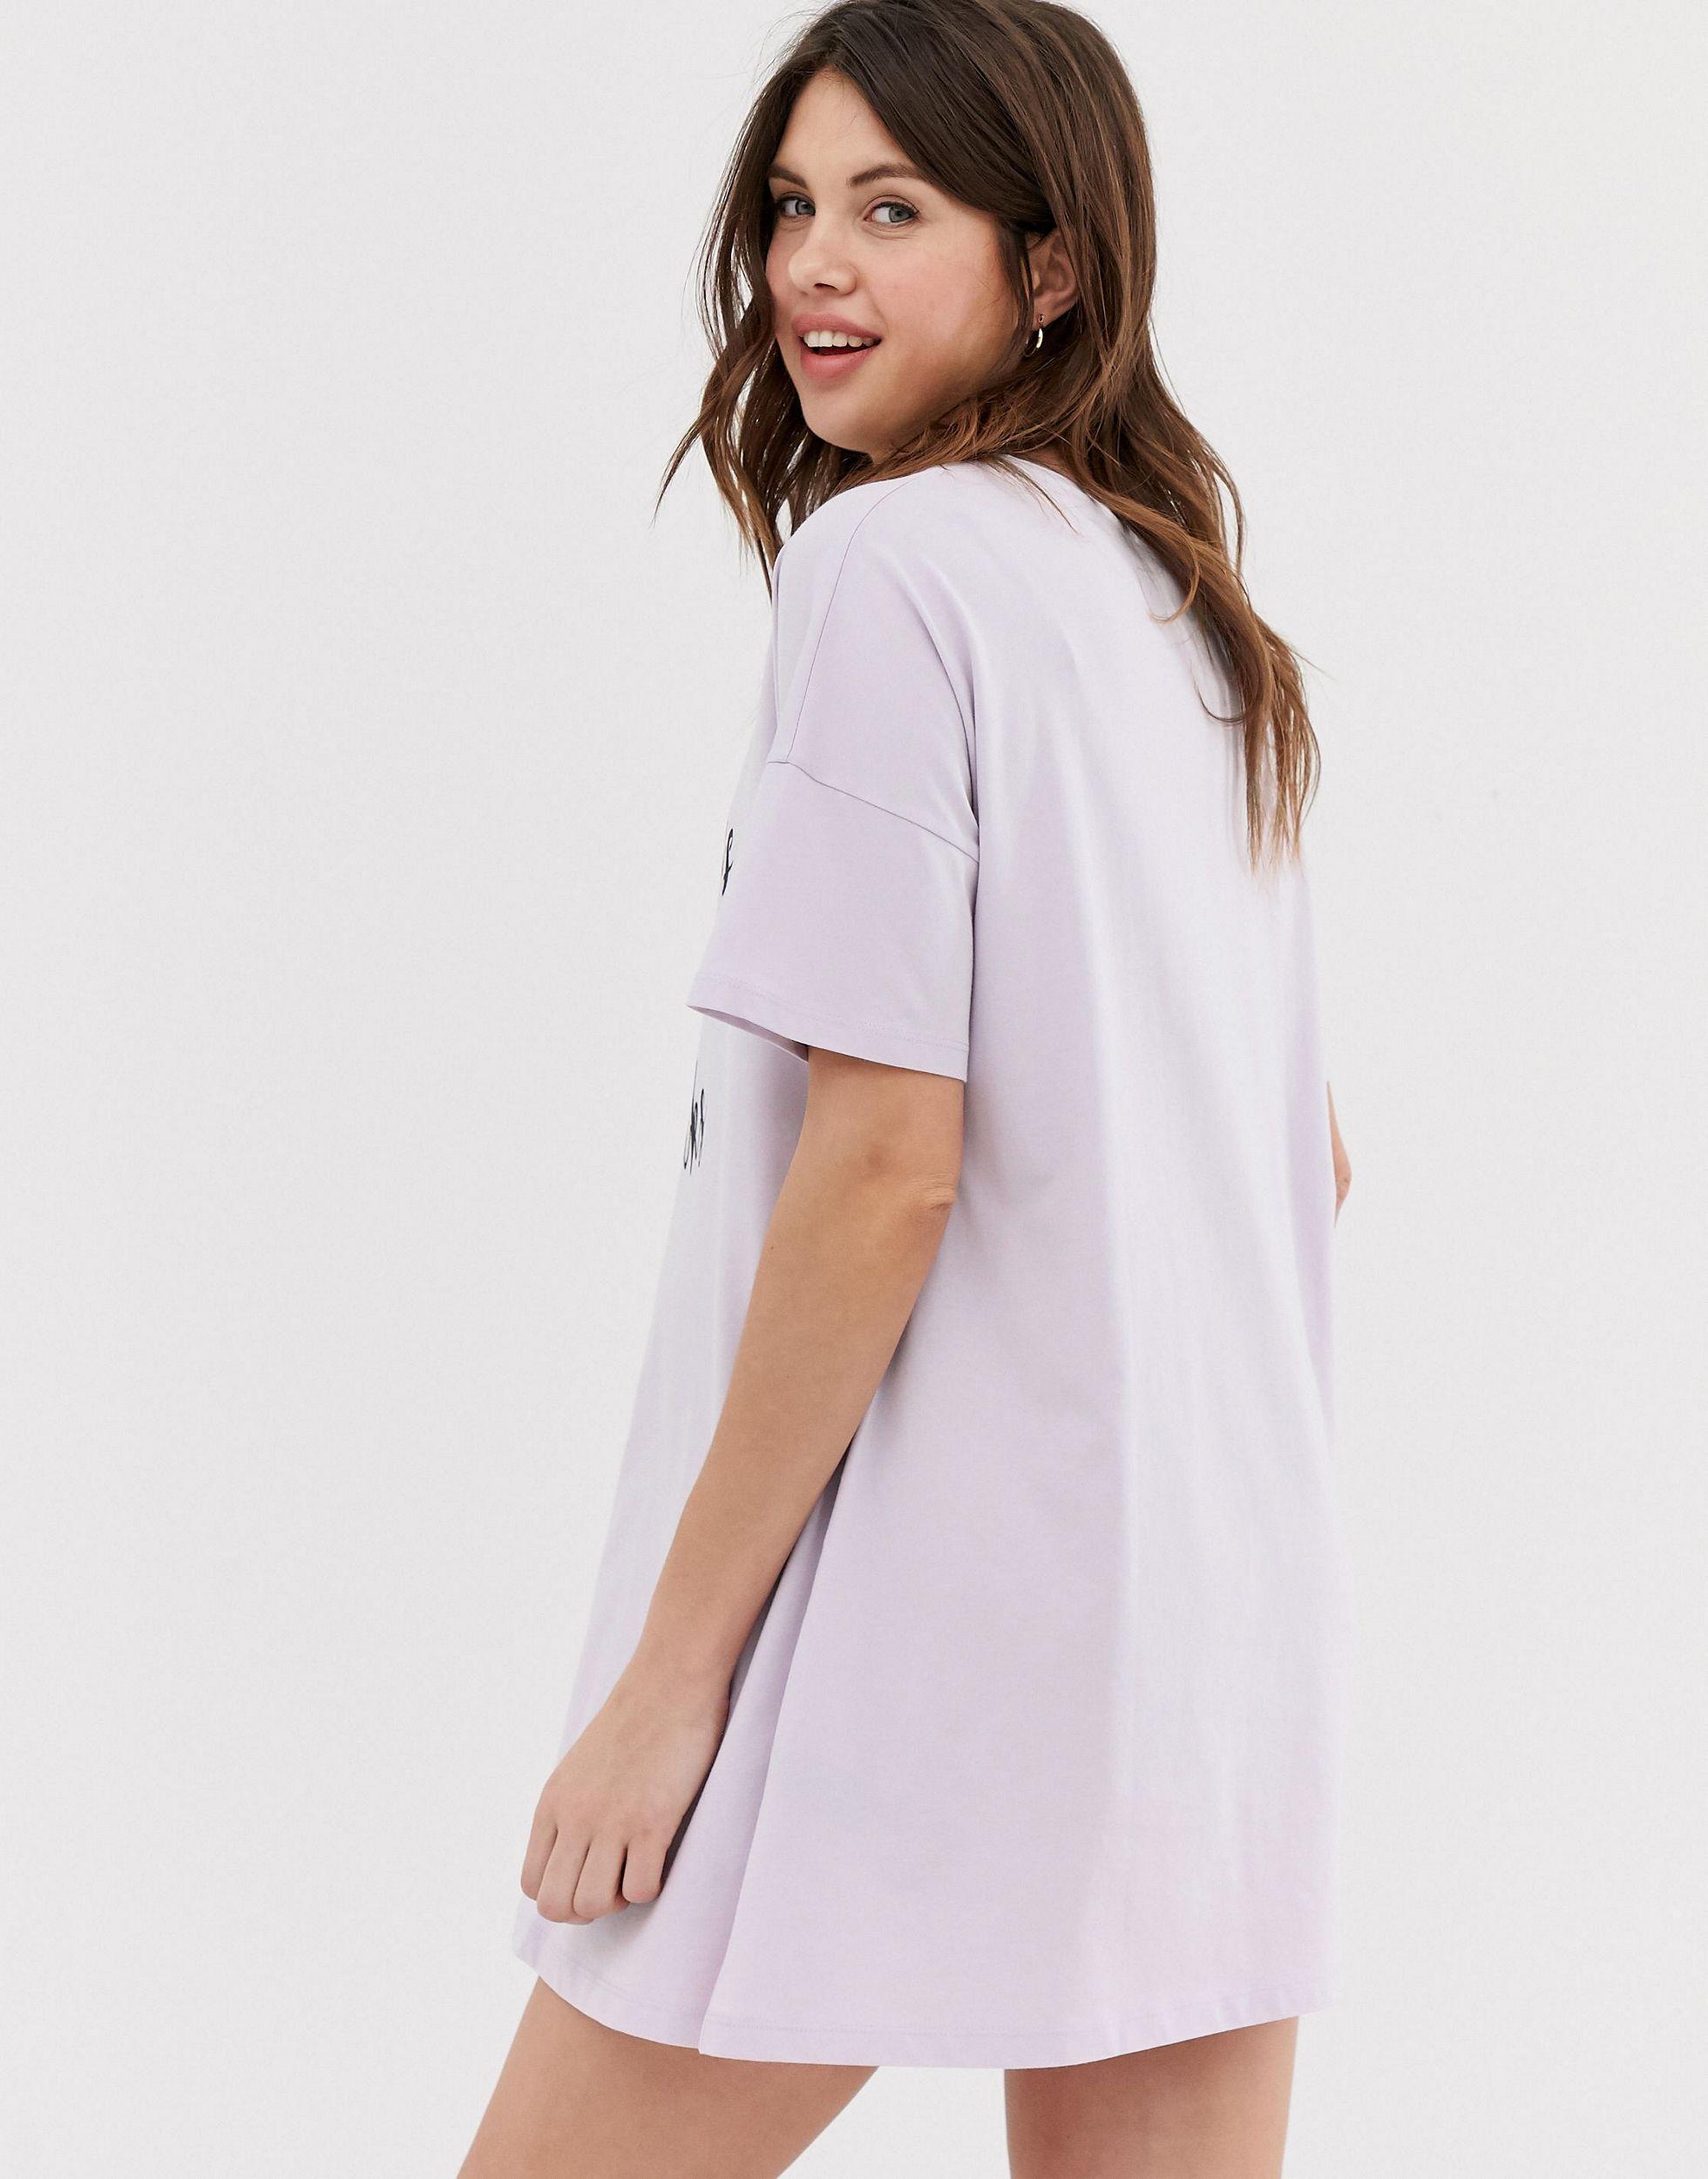 ASOS DESIGN Maternity - Chick flicks & baby kicks - T-shirt Coton ASOS en coloris Rose